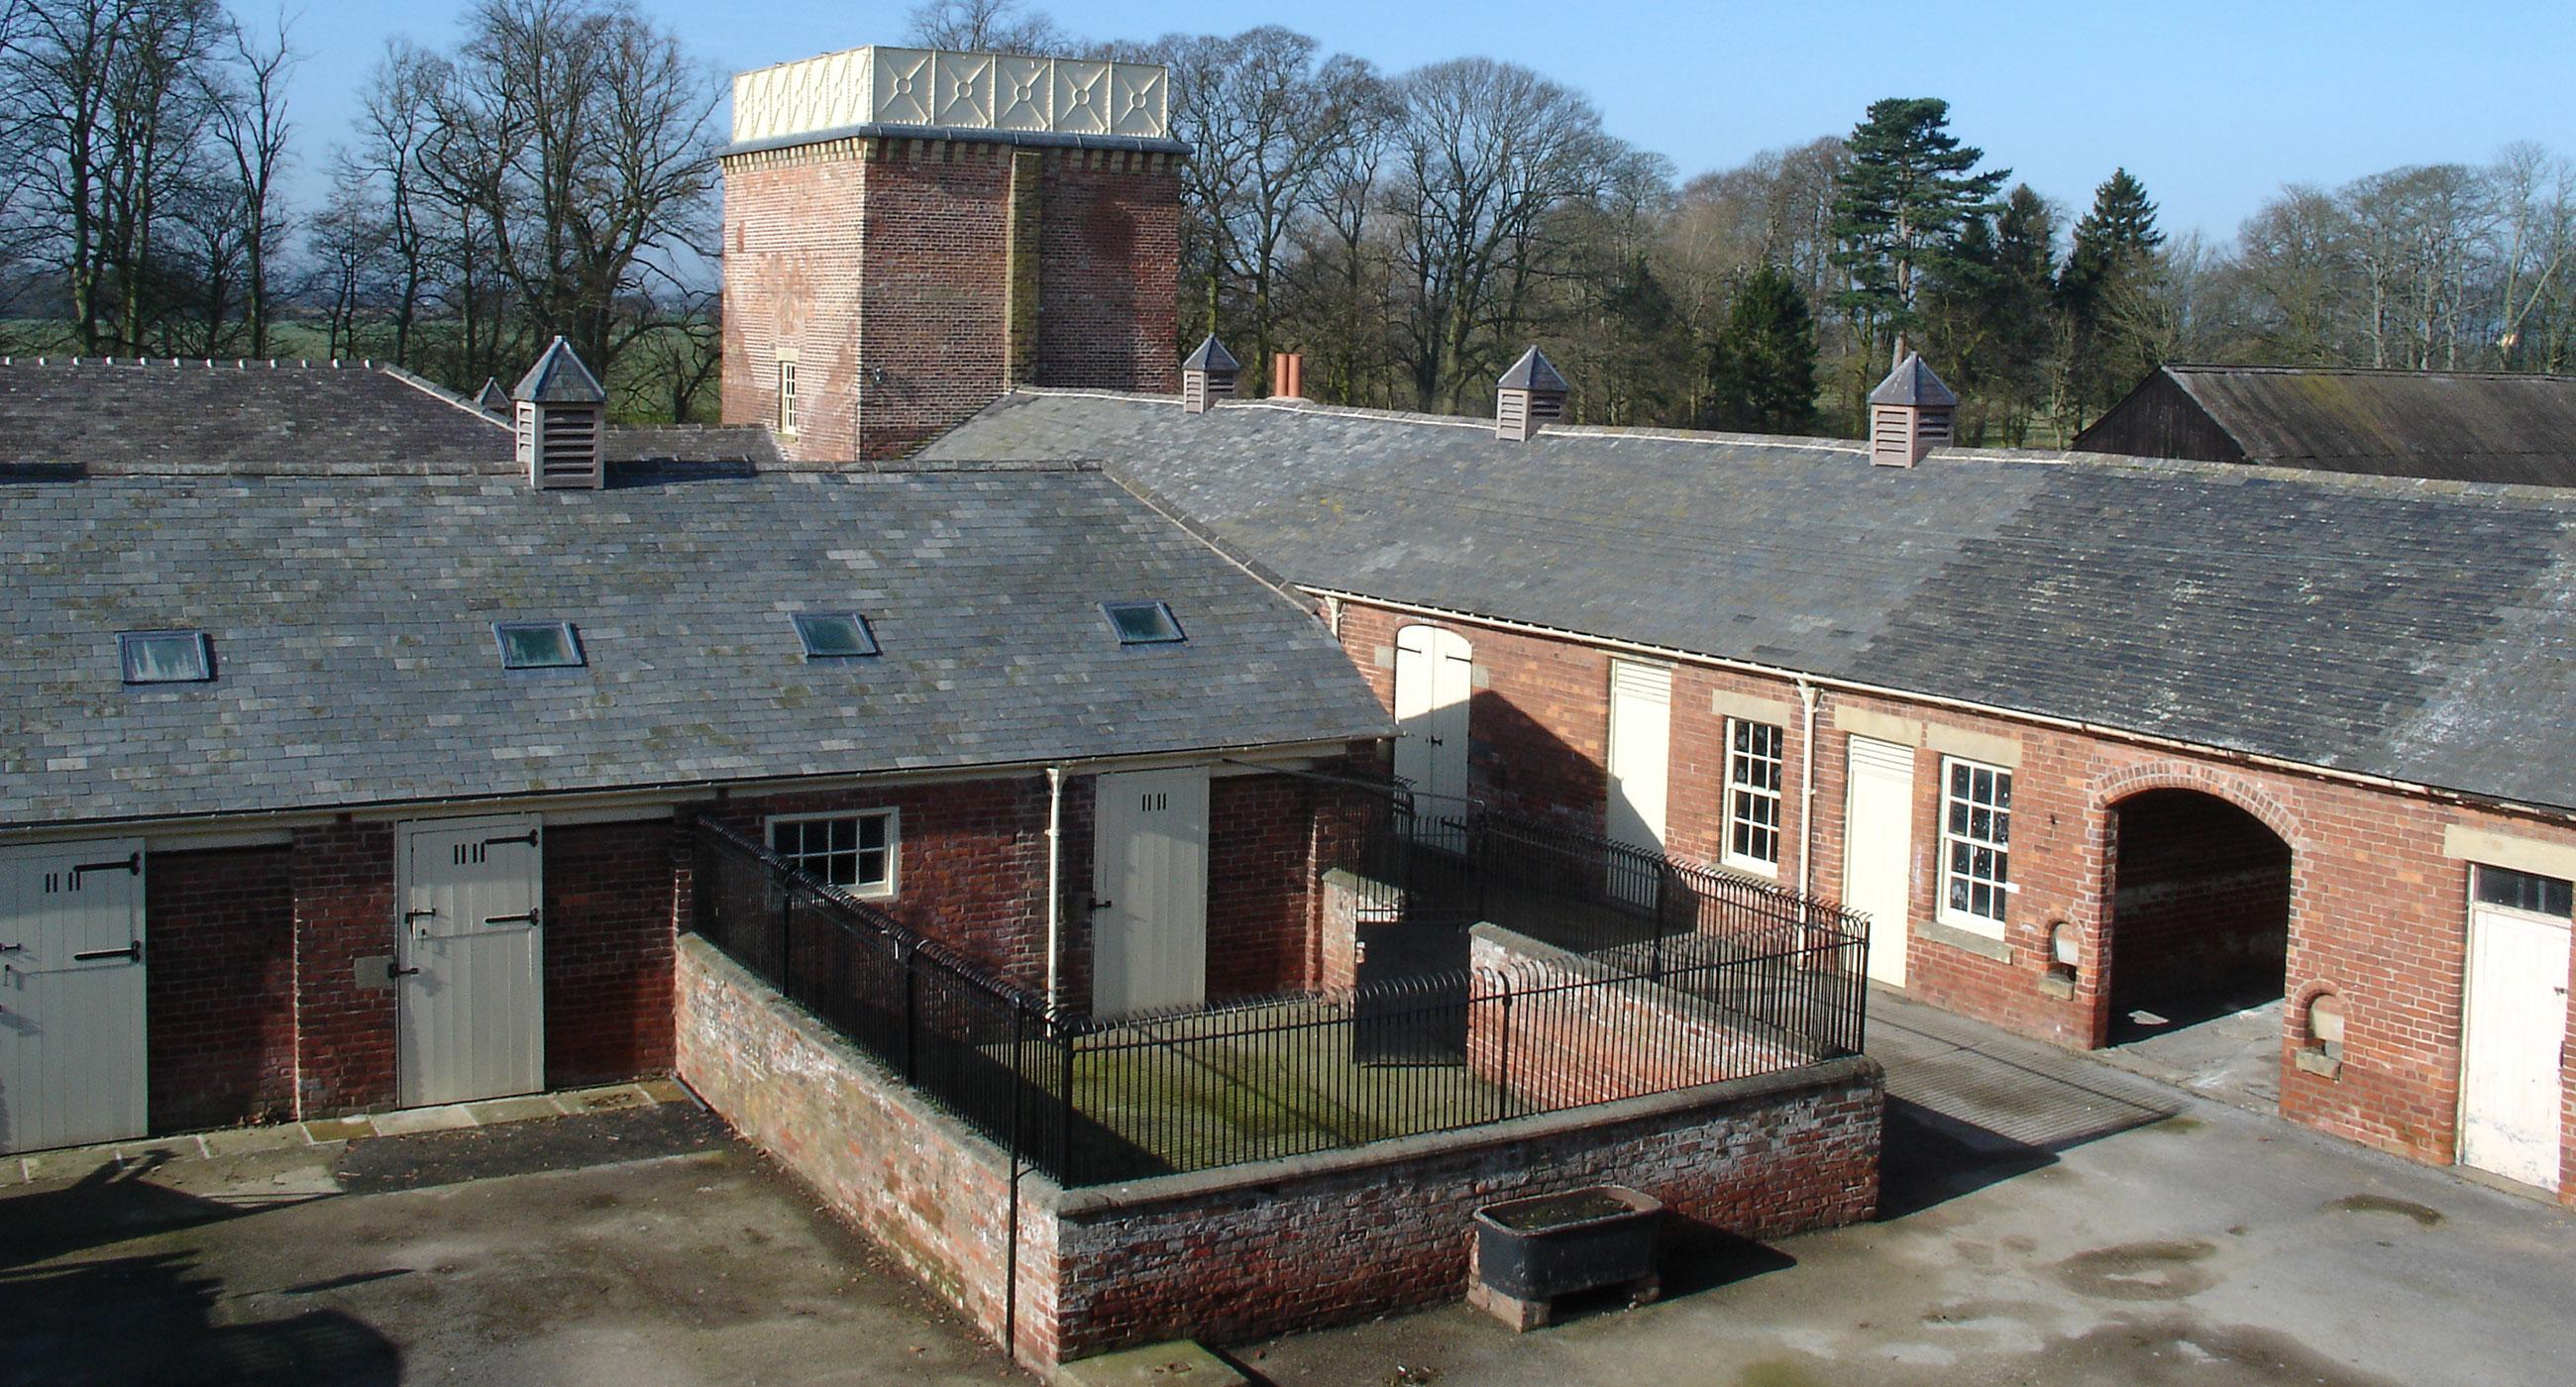 Myton Stud Farm - A heritage renovation of a Victorian model farm